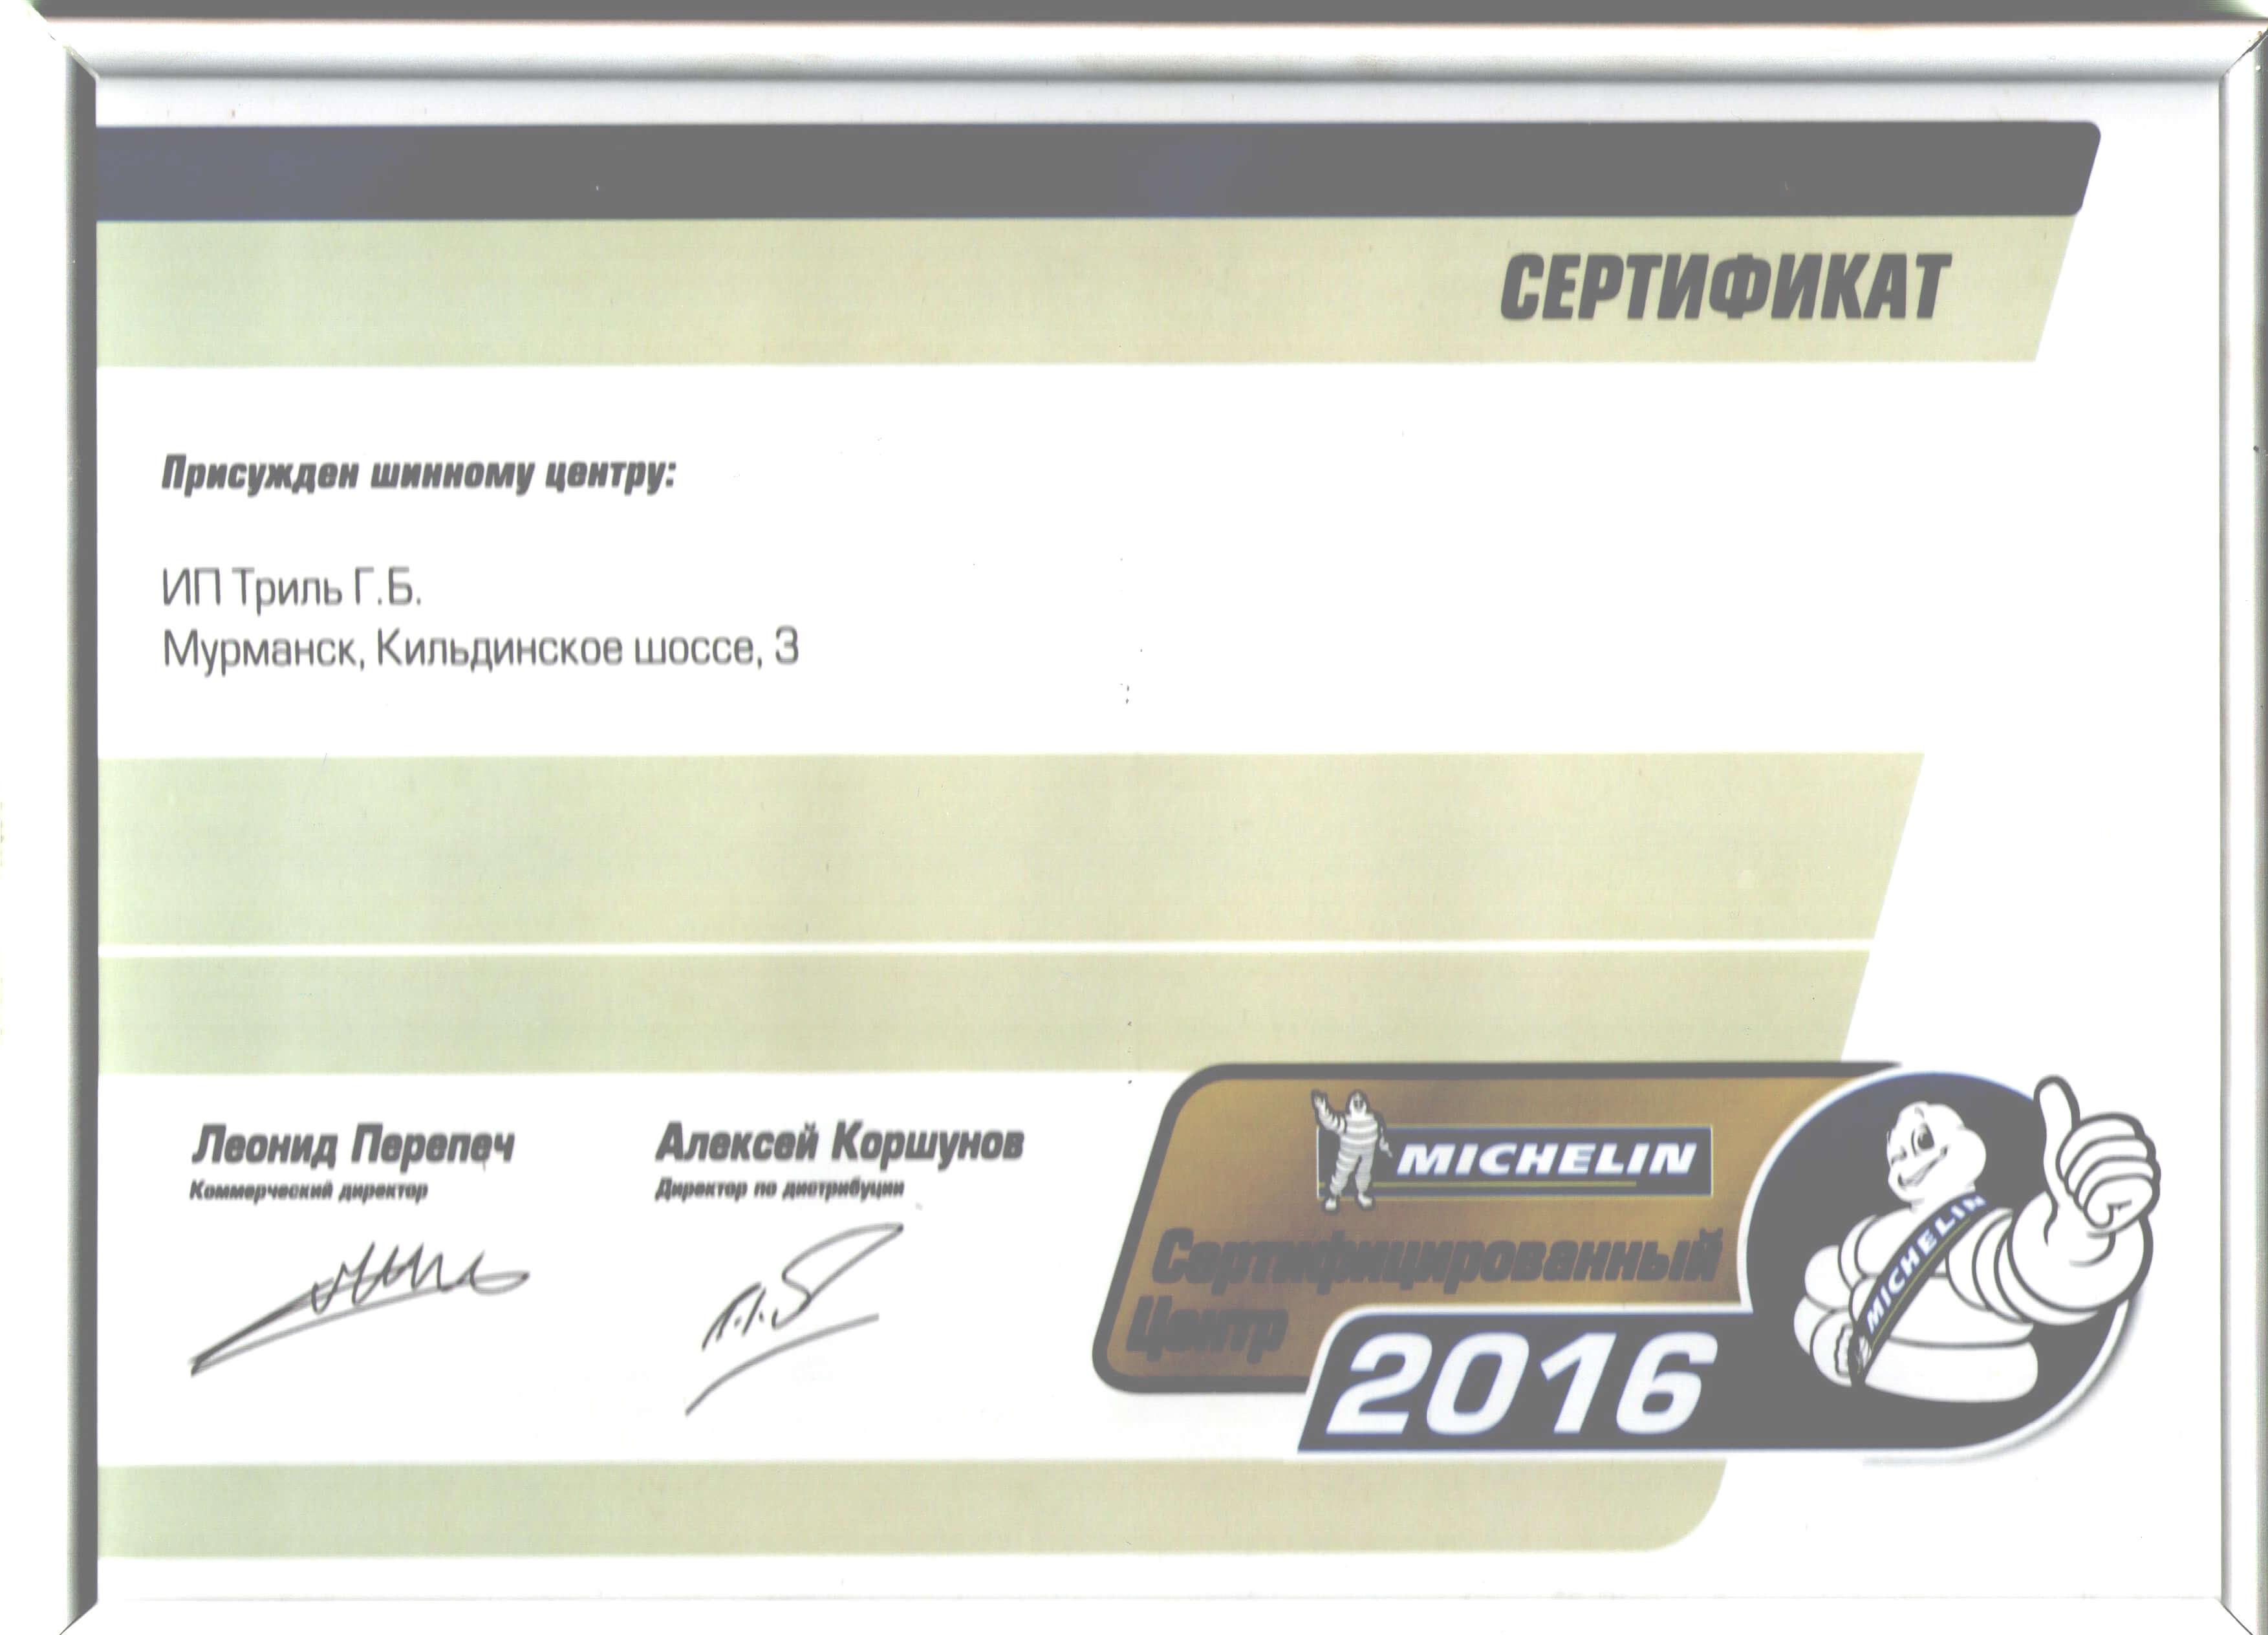 Сертификат 2016-1